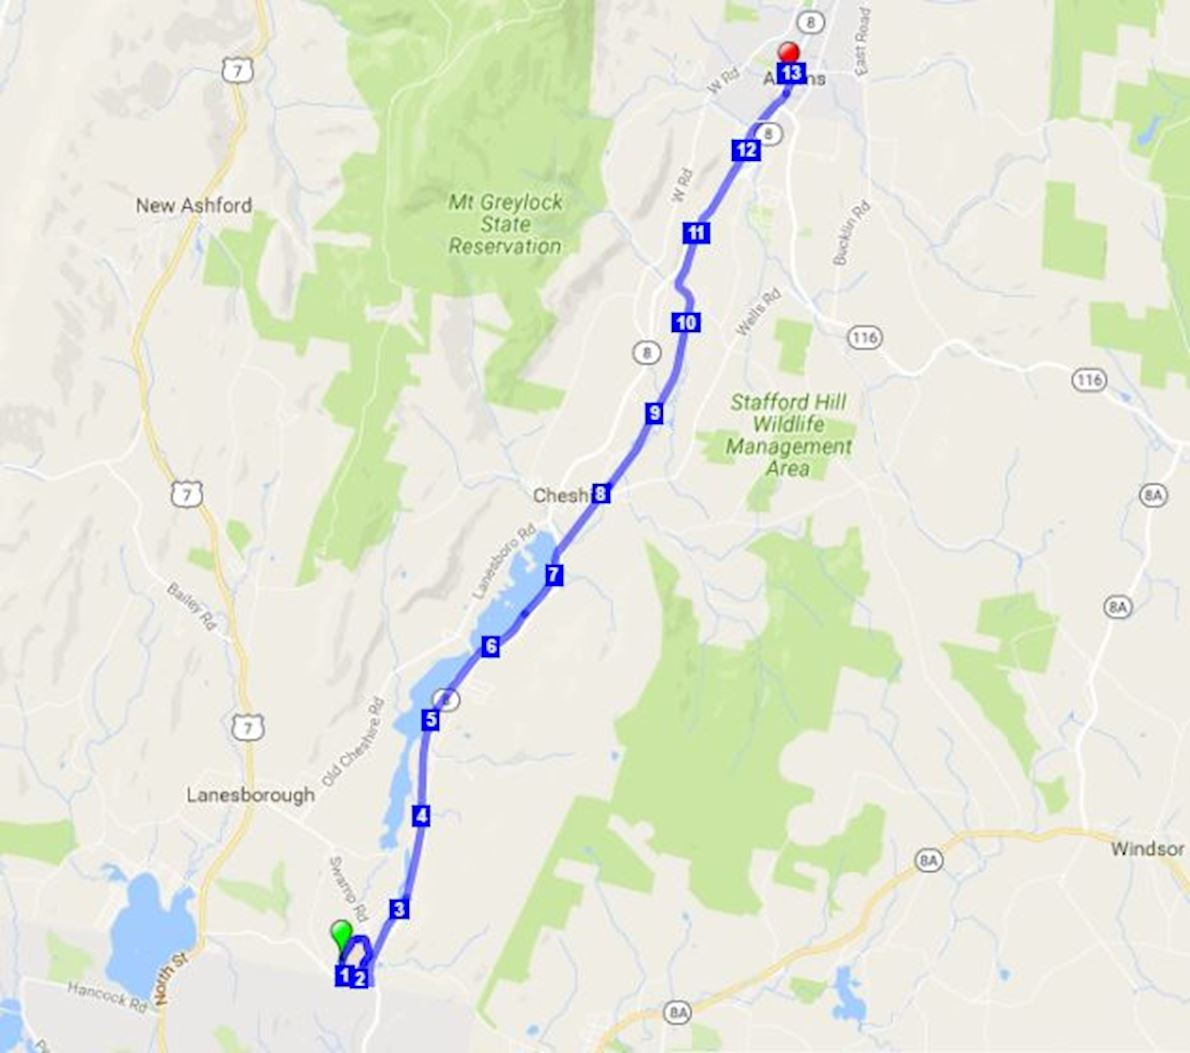 Steel Rail Half Marathon Routenkarte